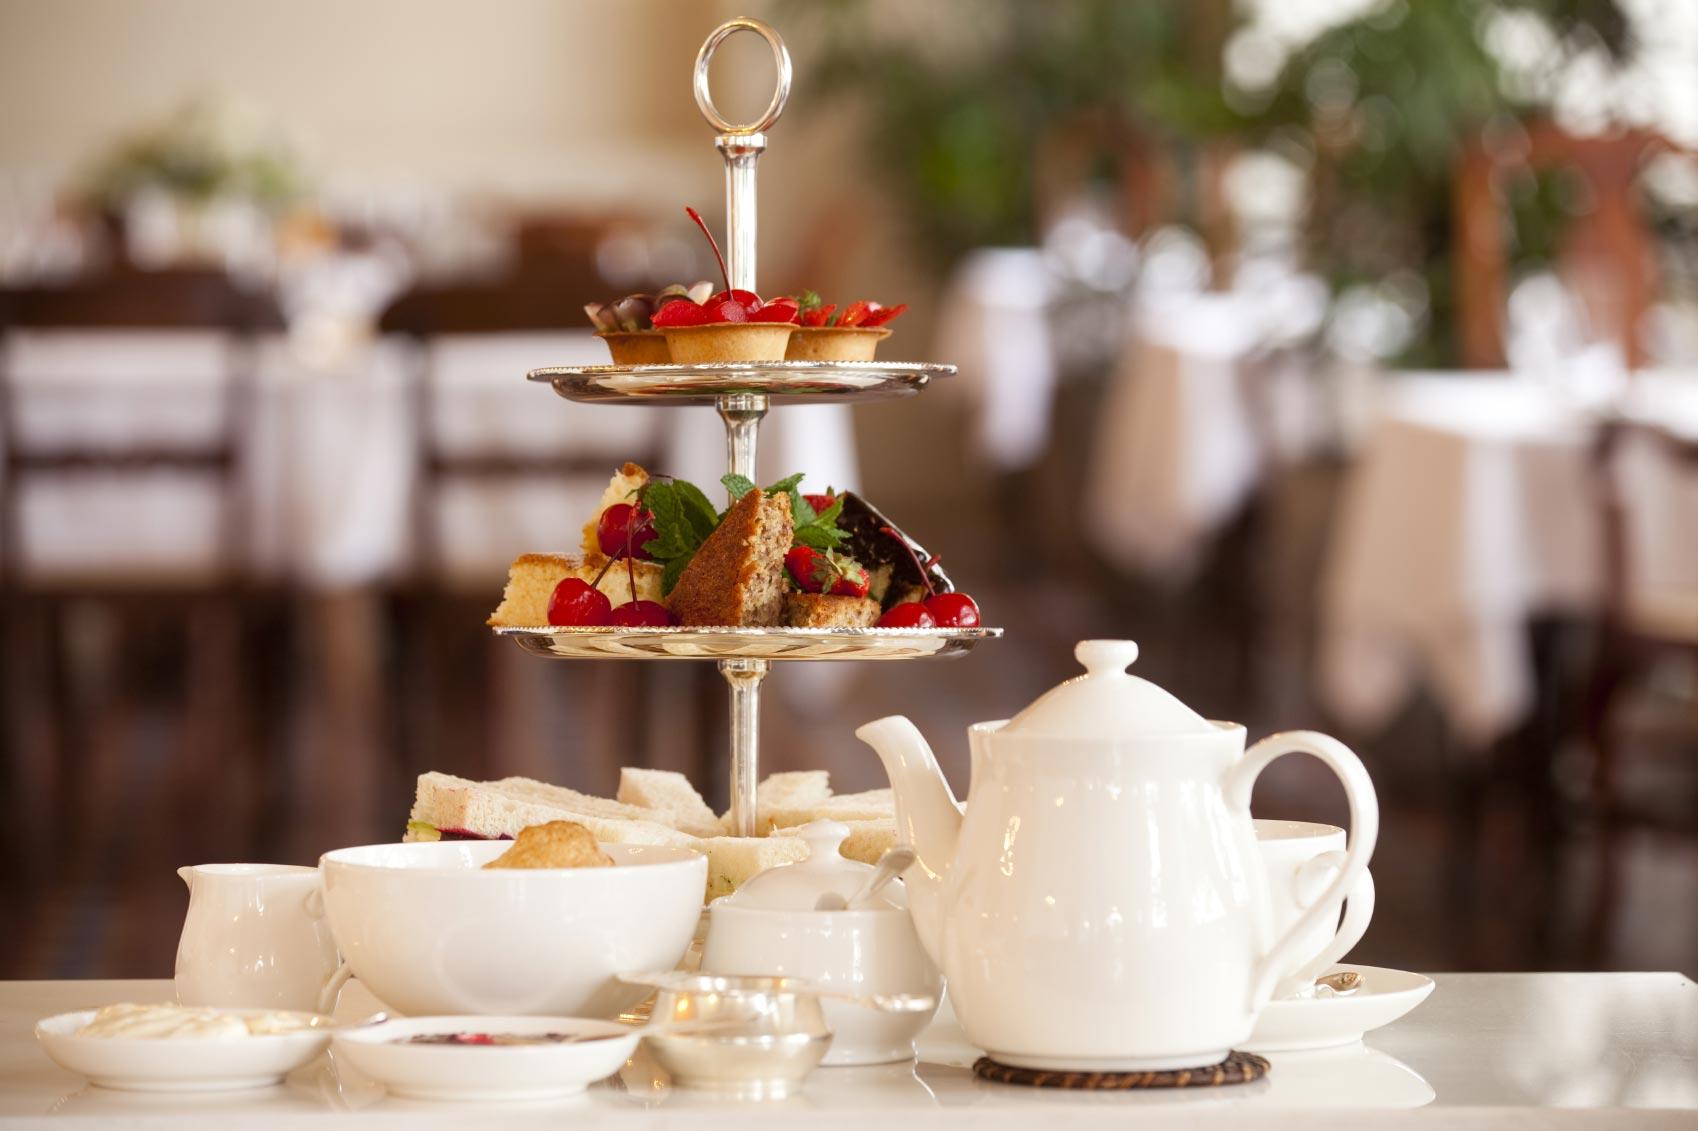 Prendre un fabuleux afternoon tea